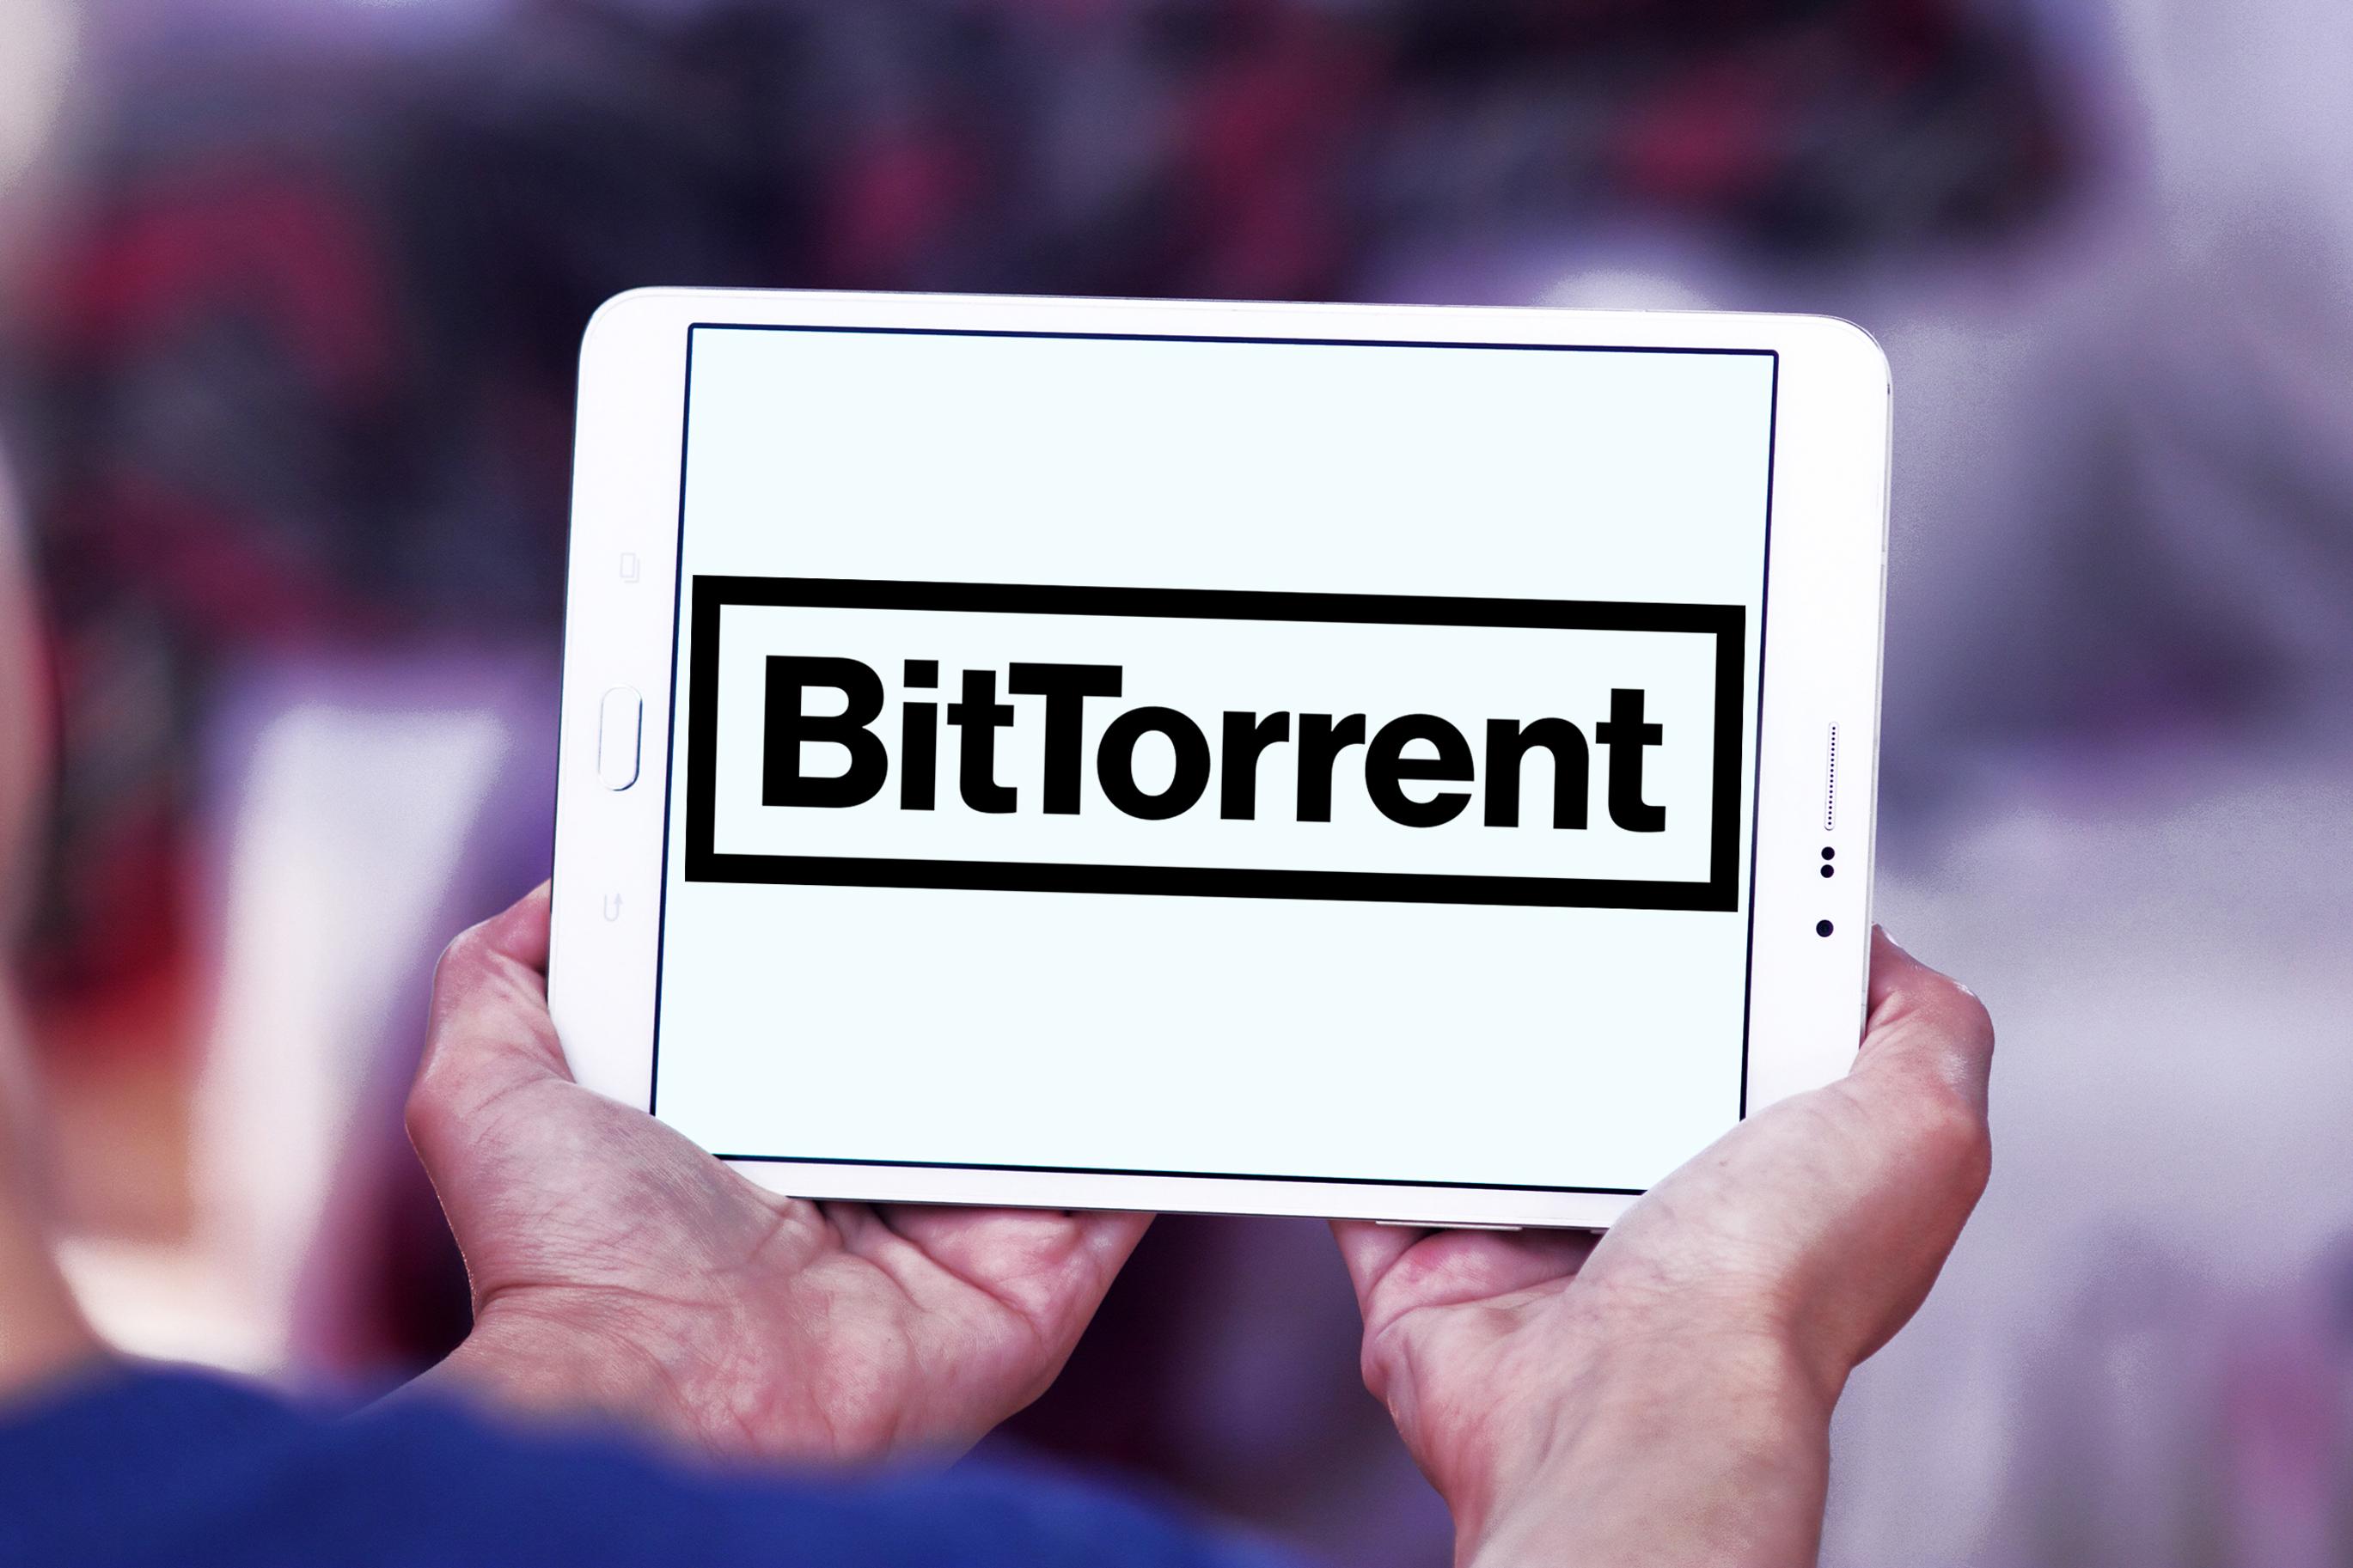 Tron acquisterà BitTorrent